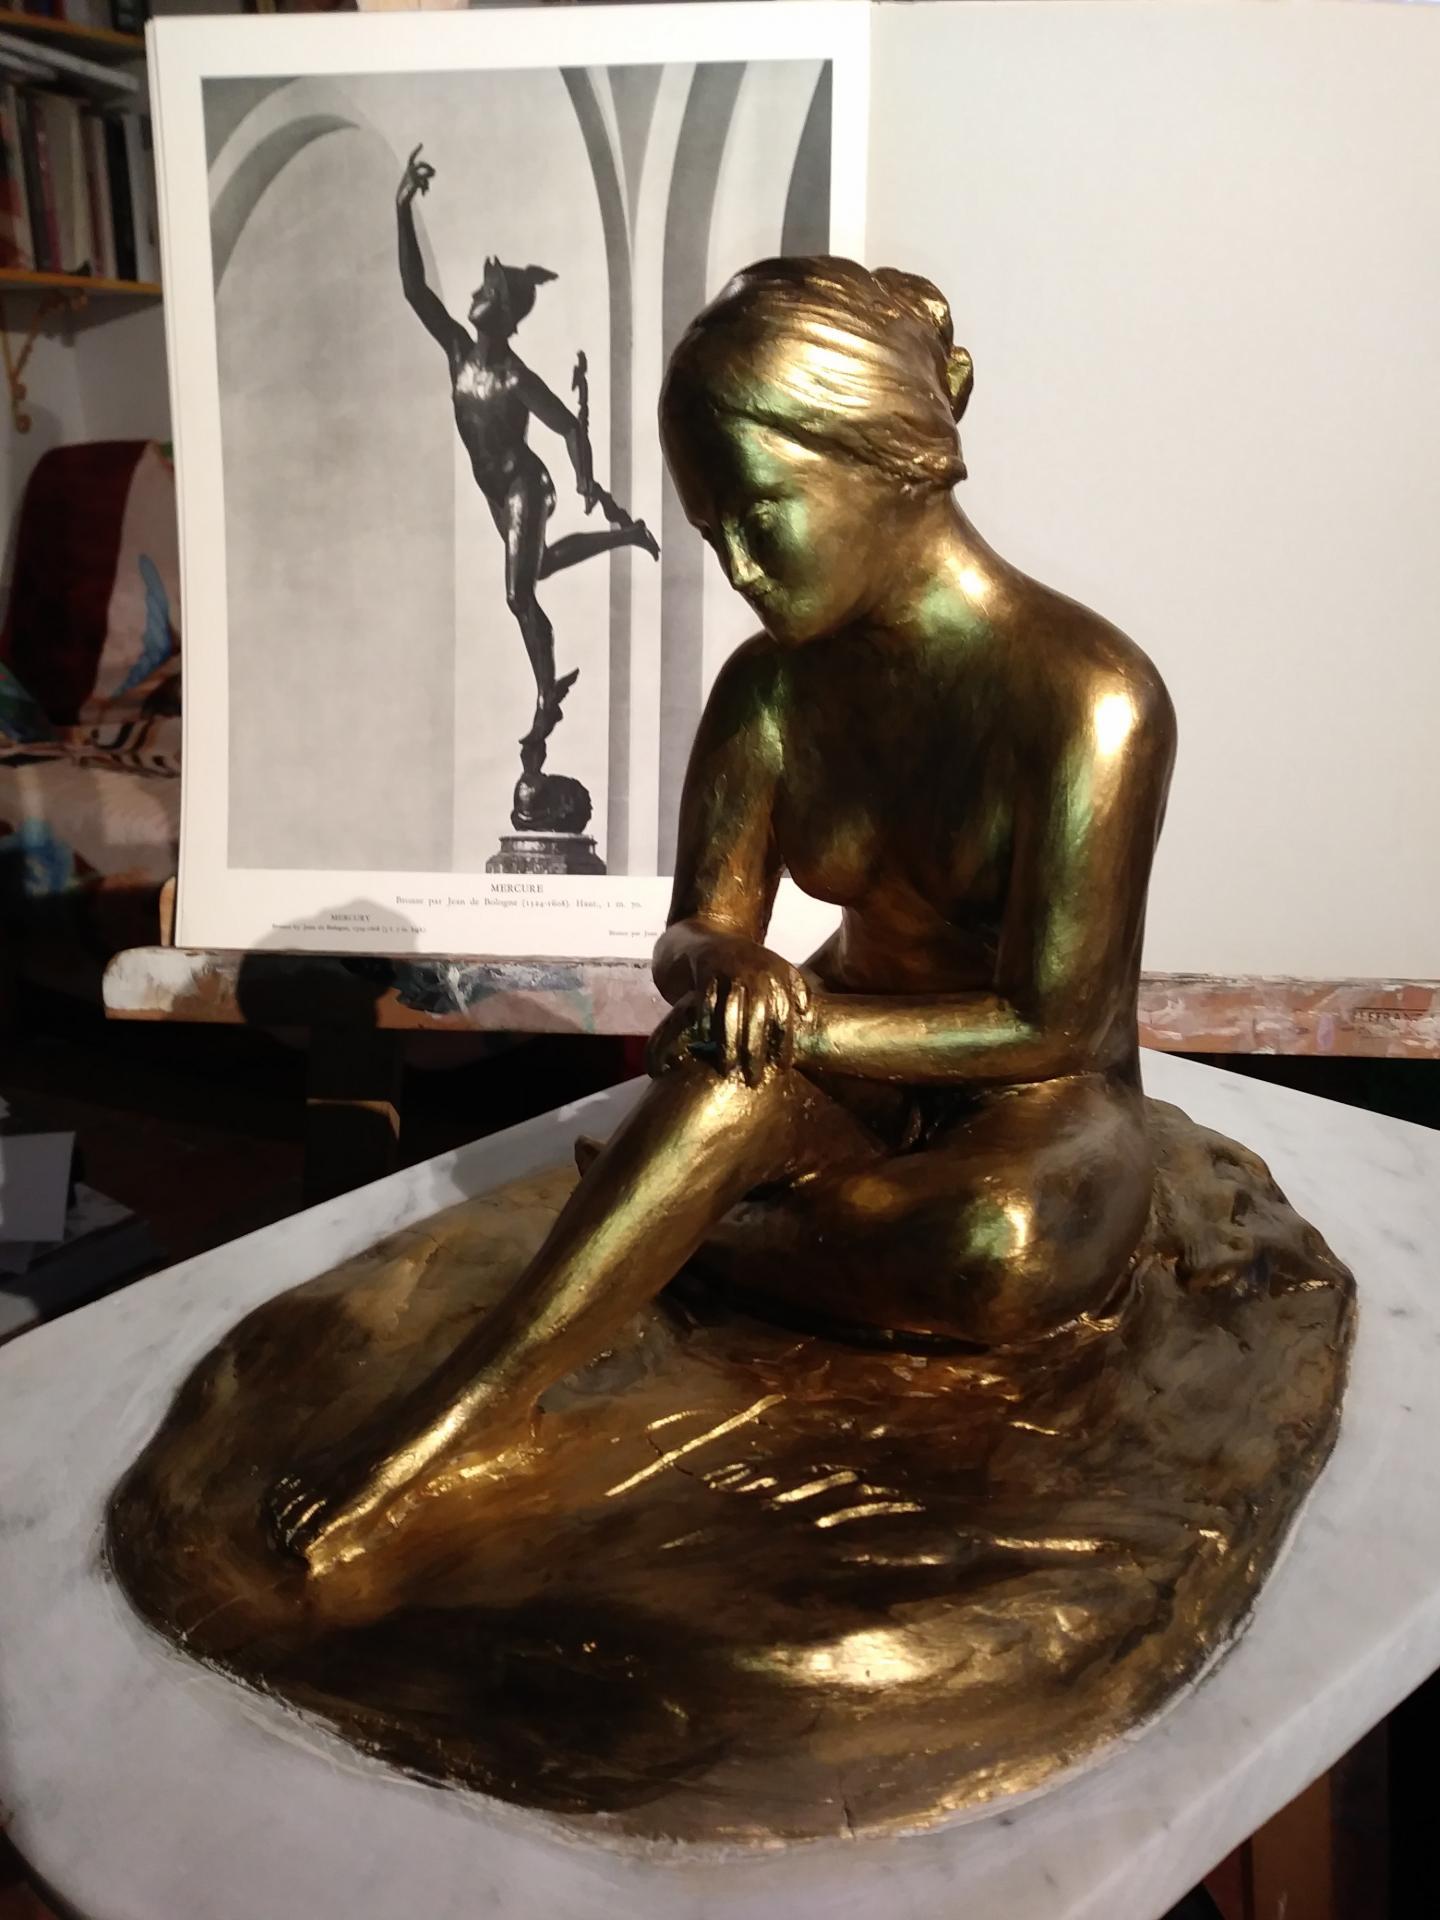 Sculpture de nue, argile patinée (baigneuse) 2